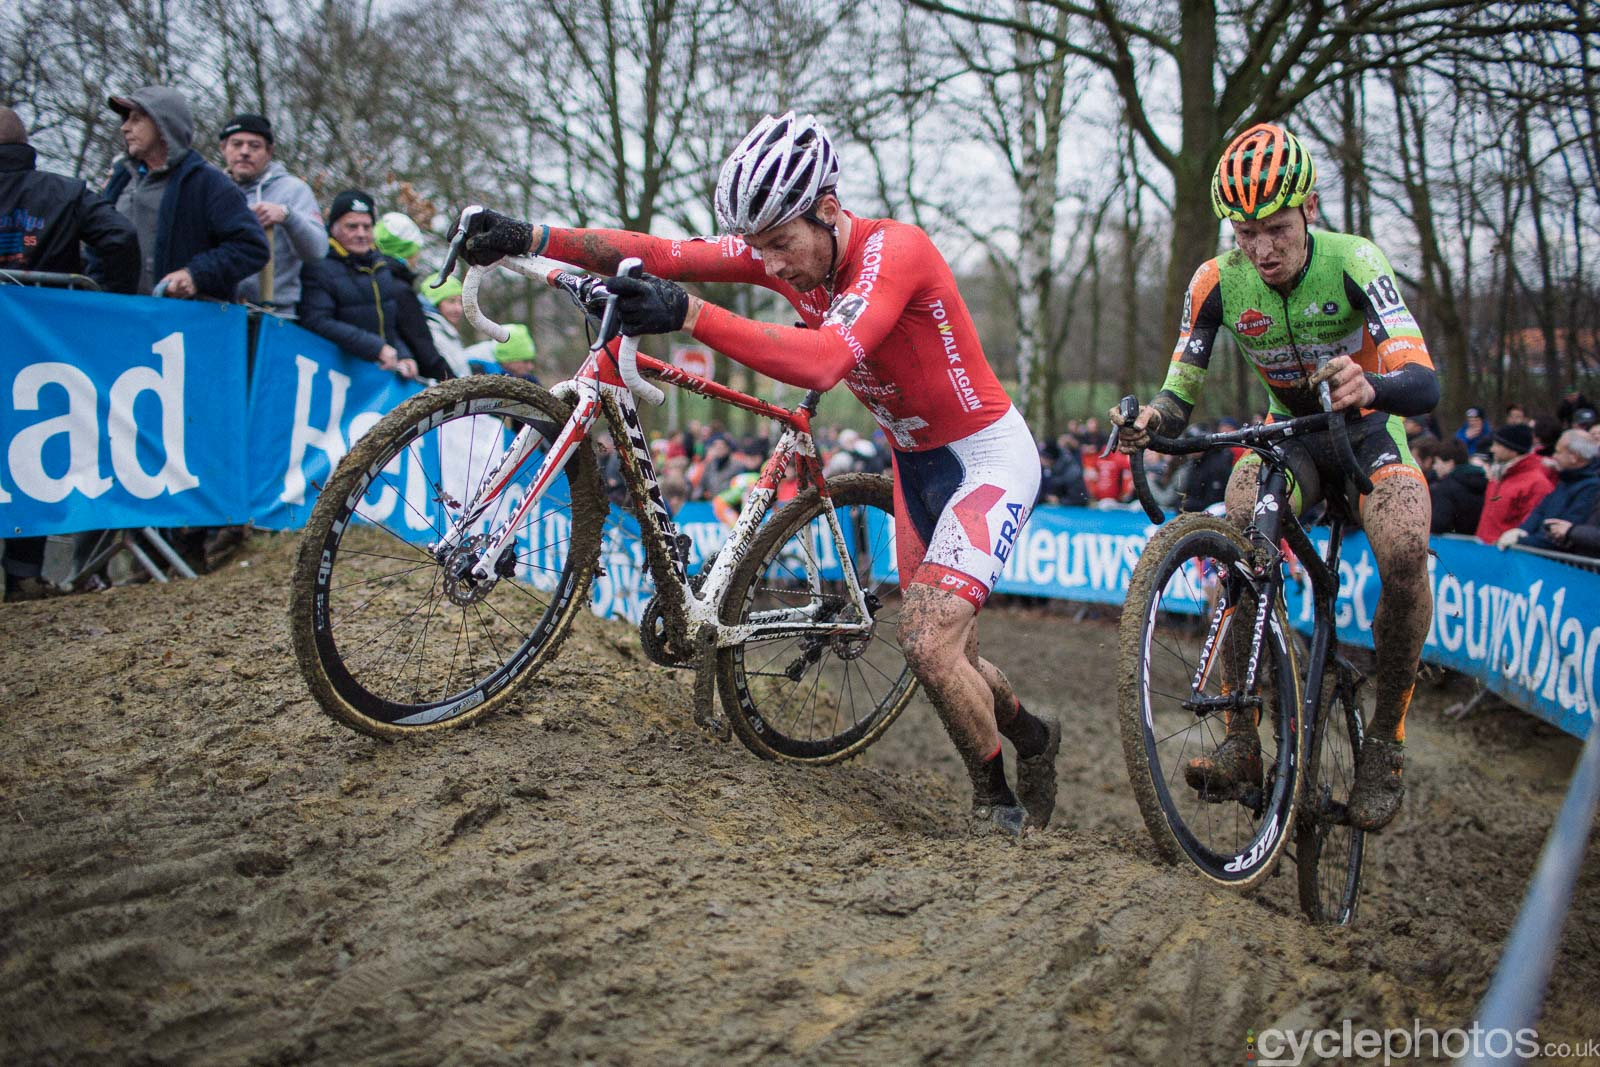 2016-cyclephotos-cyclocross-gpsvennys-154216-julien-taramarcaz-tim-merlier